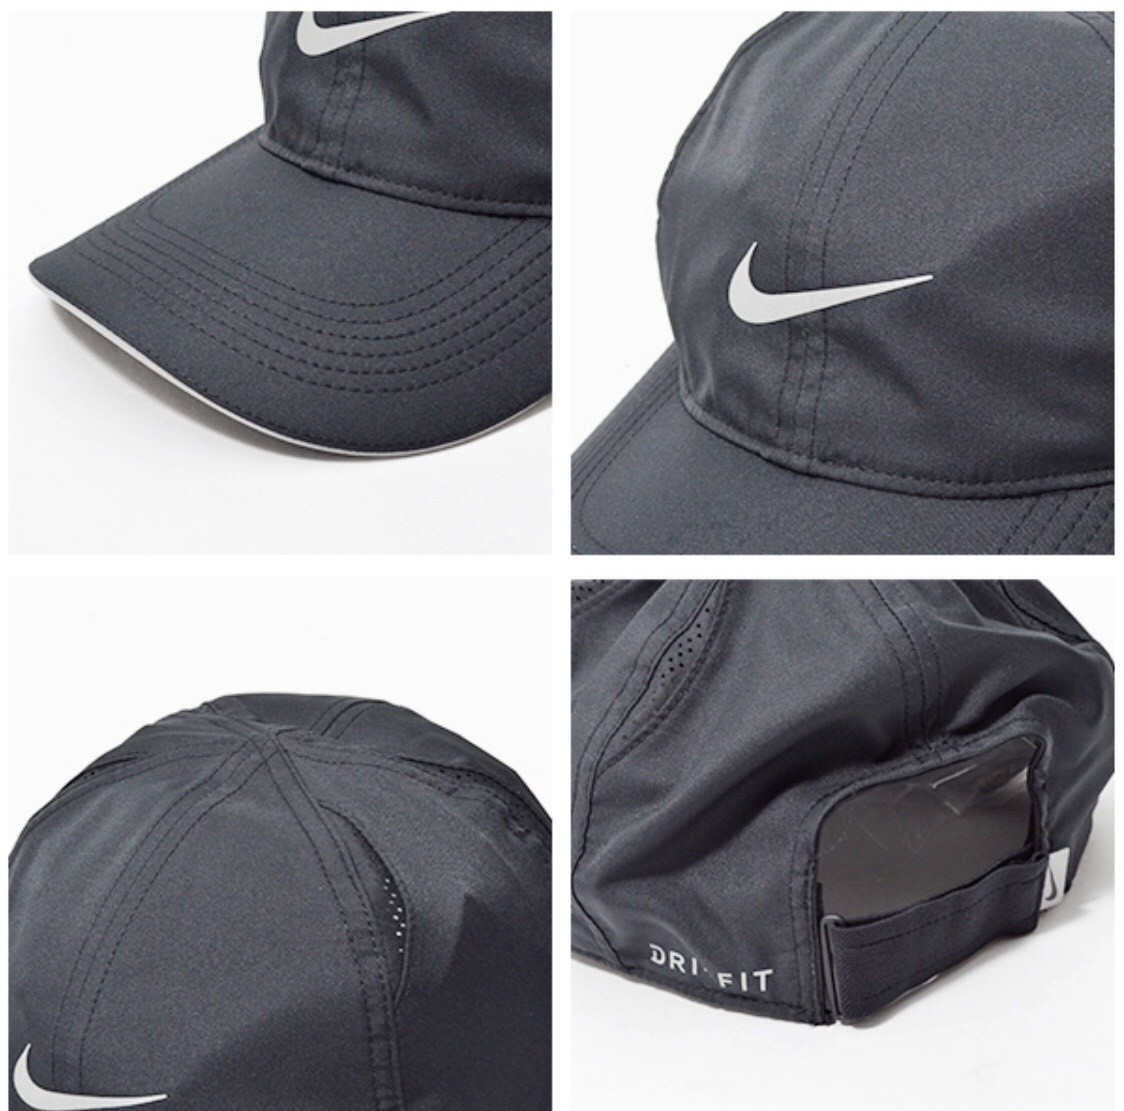 NIKE ナイキ ランニング フェザーライトキャップ ラン 帽子 ブラック 黒